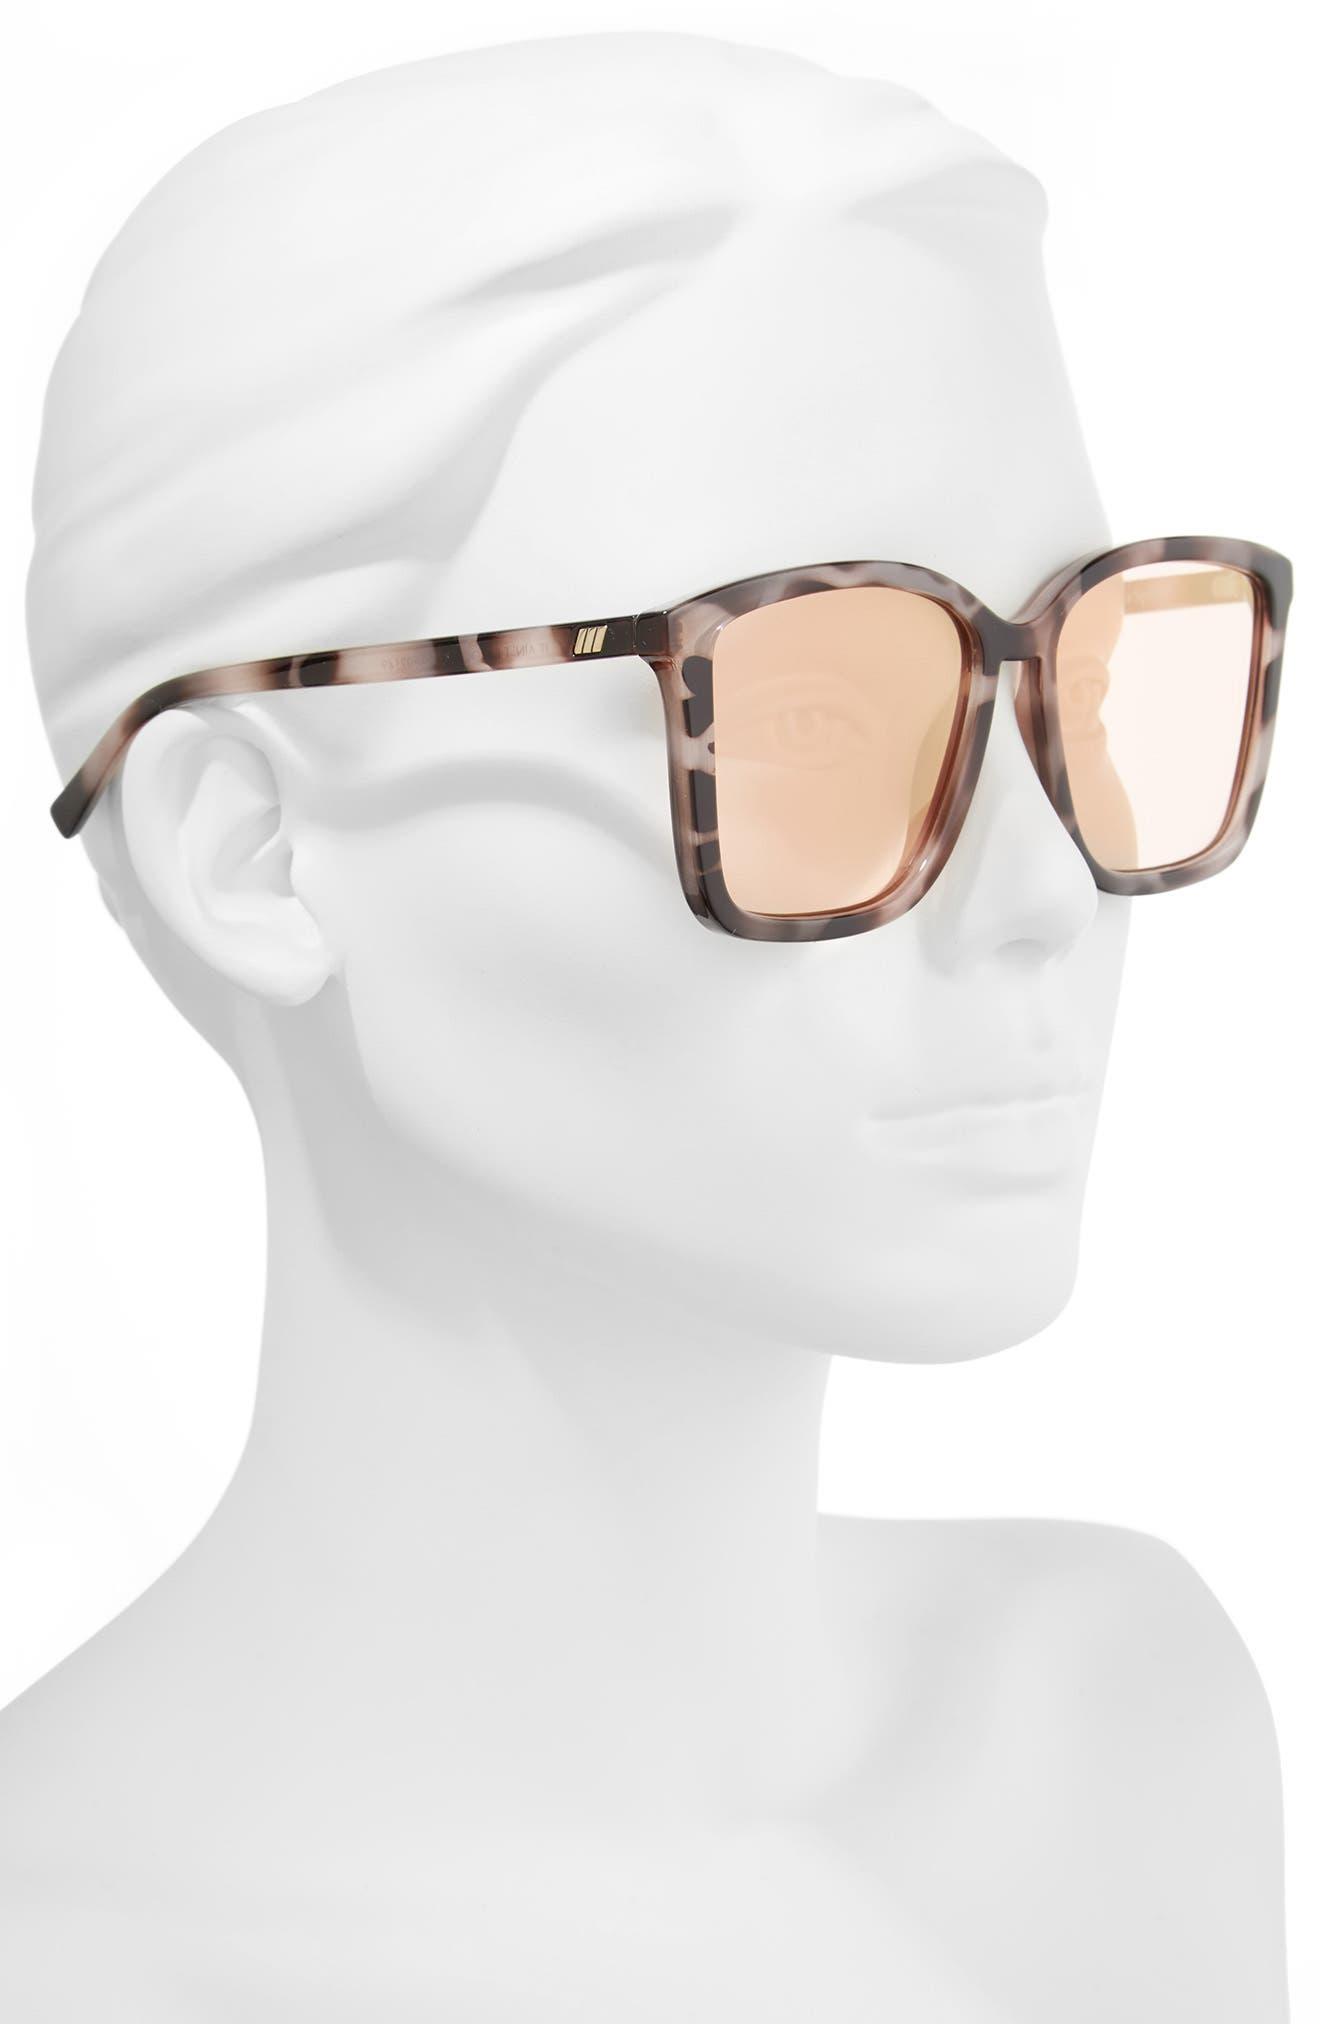 It Ain't Baroque 55mm Sunglasses,                             Alternate thumbnail 2, color,                             APRICOT TORT